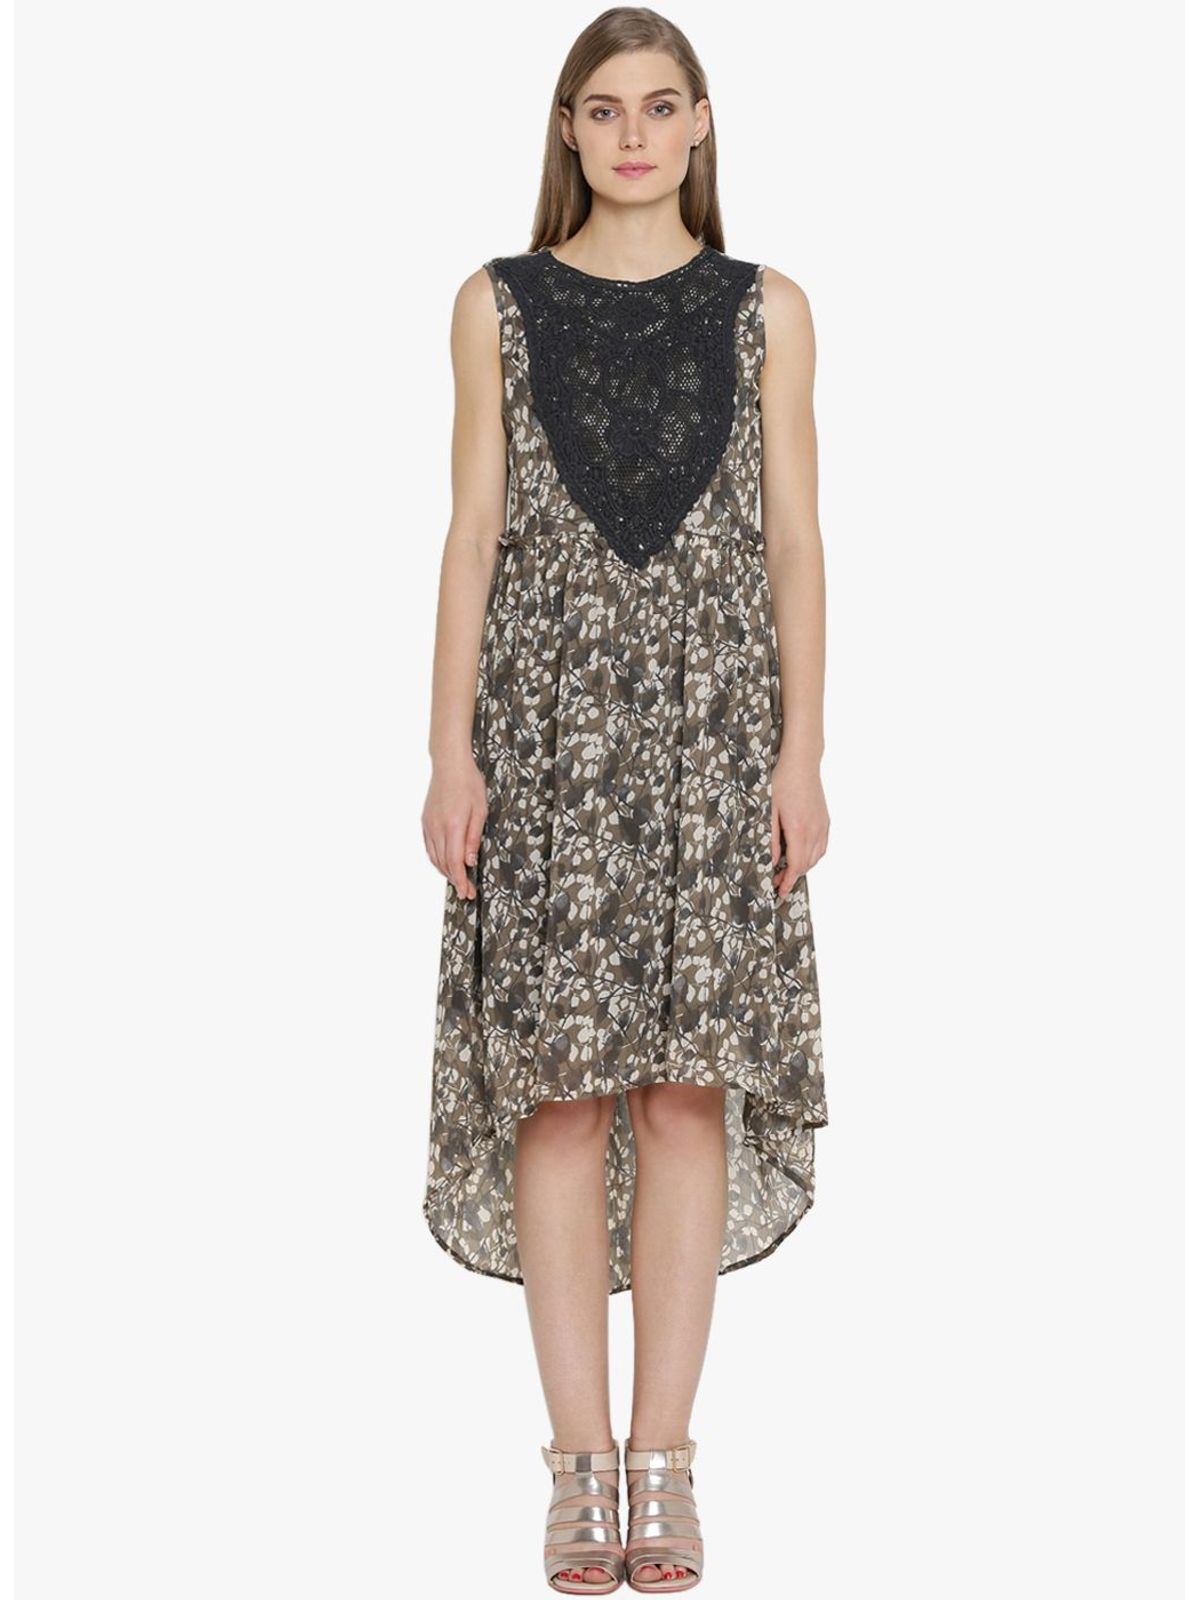 ANDRINA LONG & SHORT CHIFFON DRESS